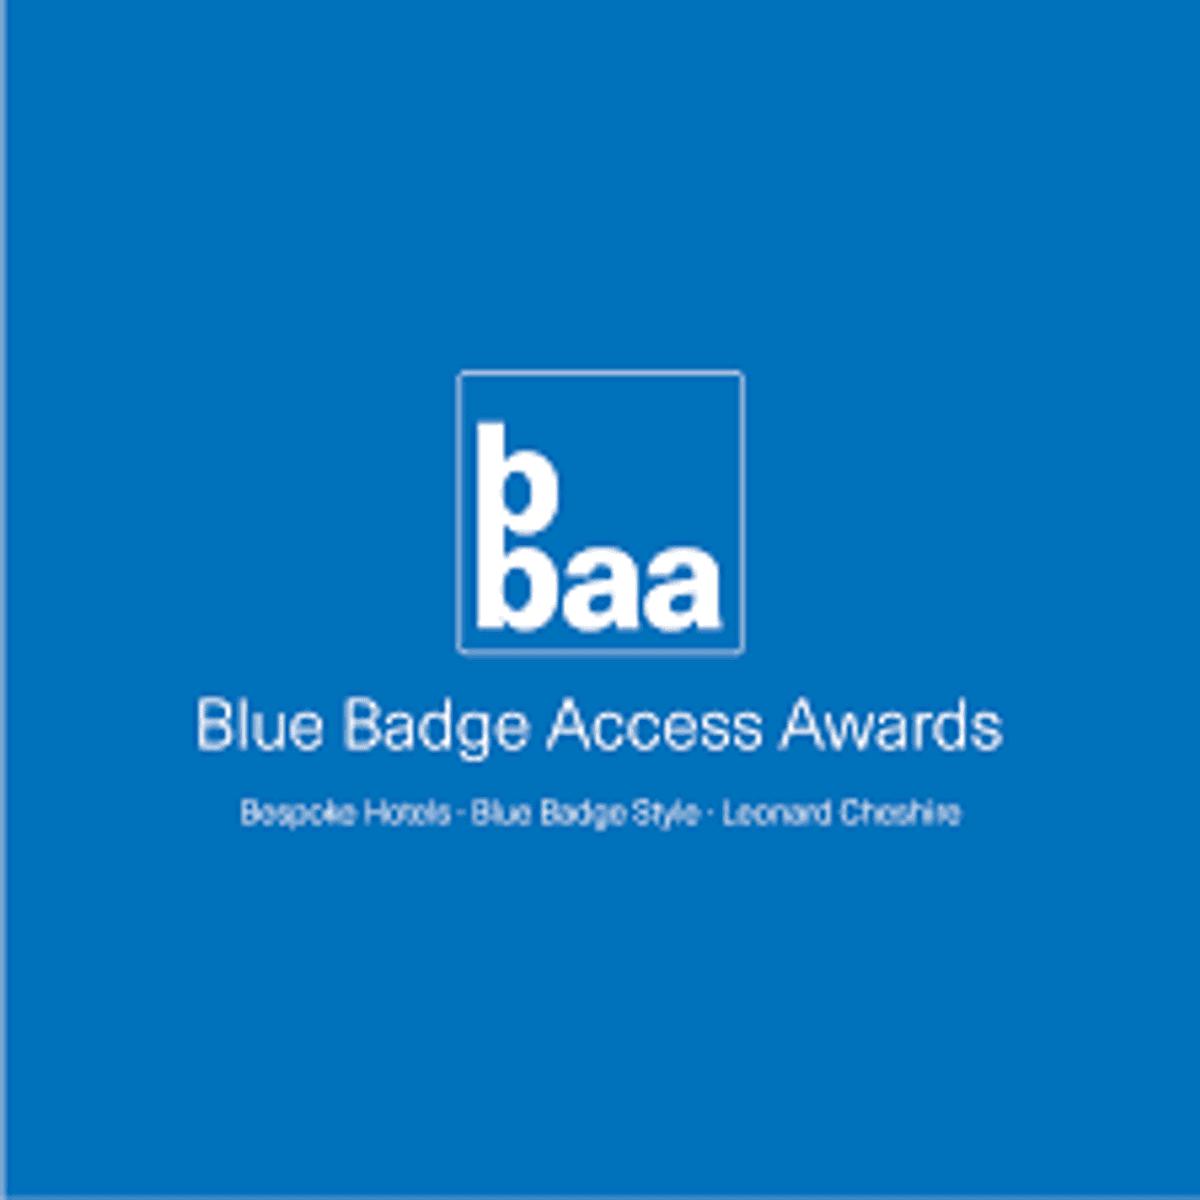 Blue Badge Access Awards 2019 logo.